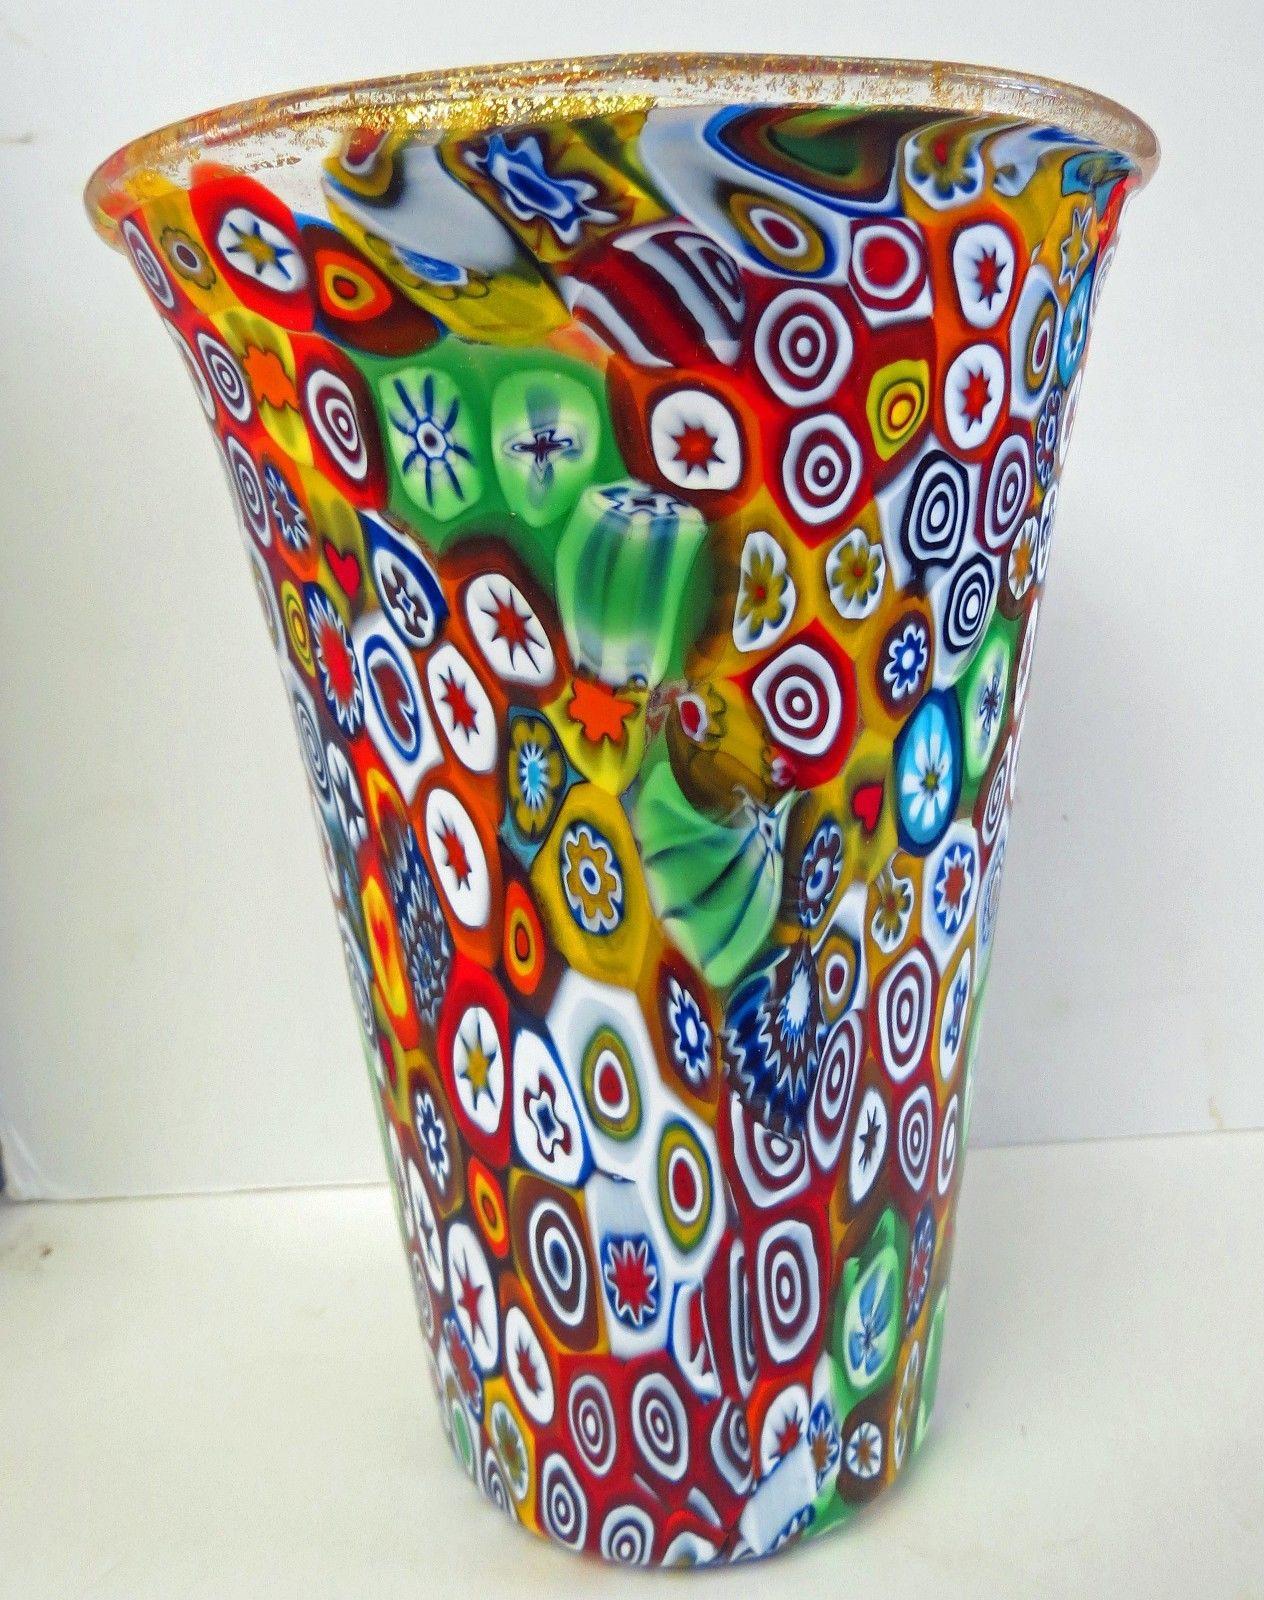 blown glass teardrop vases of murano art glass large gambaro poggi millefiori vase 375 00 with 2 of 8 murano art glass large gambaro poggi millefiori vase 3 of 8 murano art glass